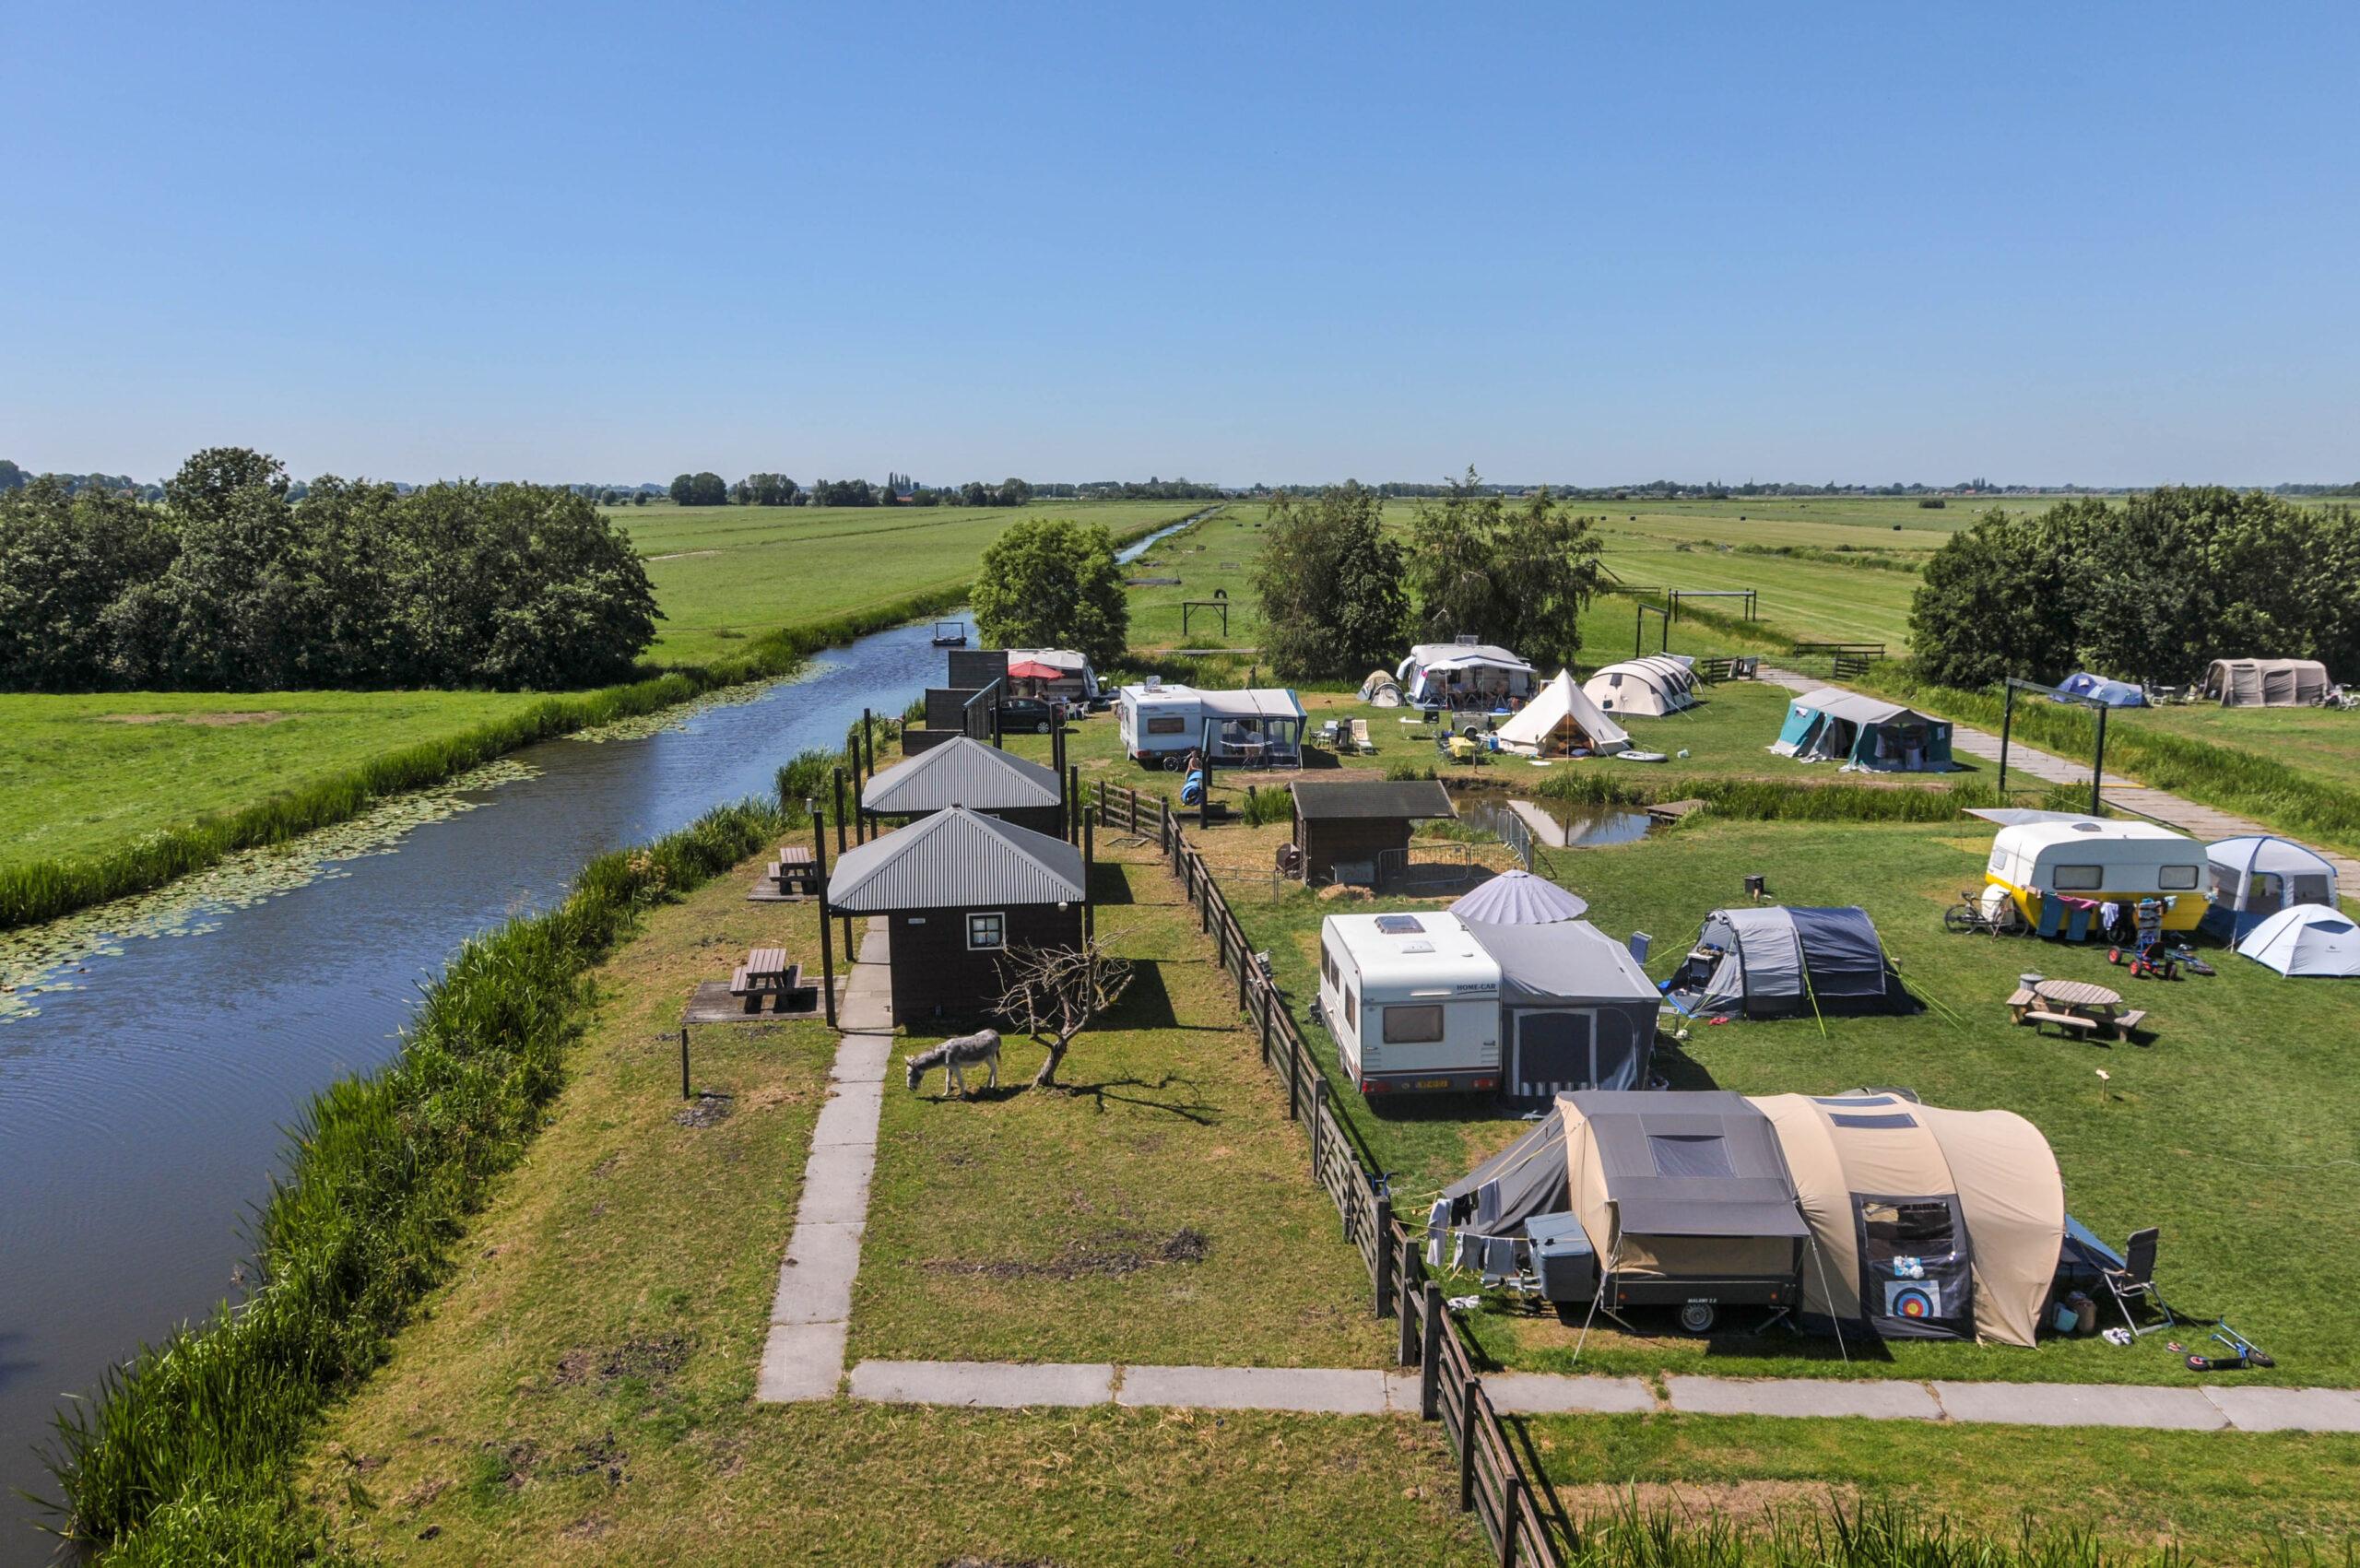 Camping Woerden - Kamerik | Camping de Boerinn